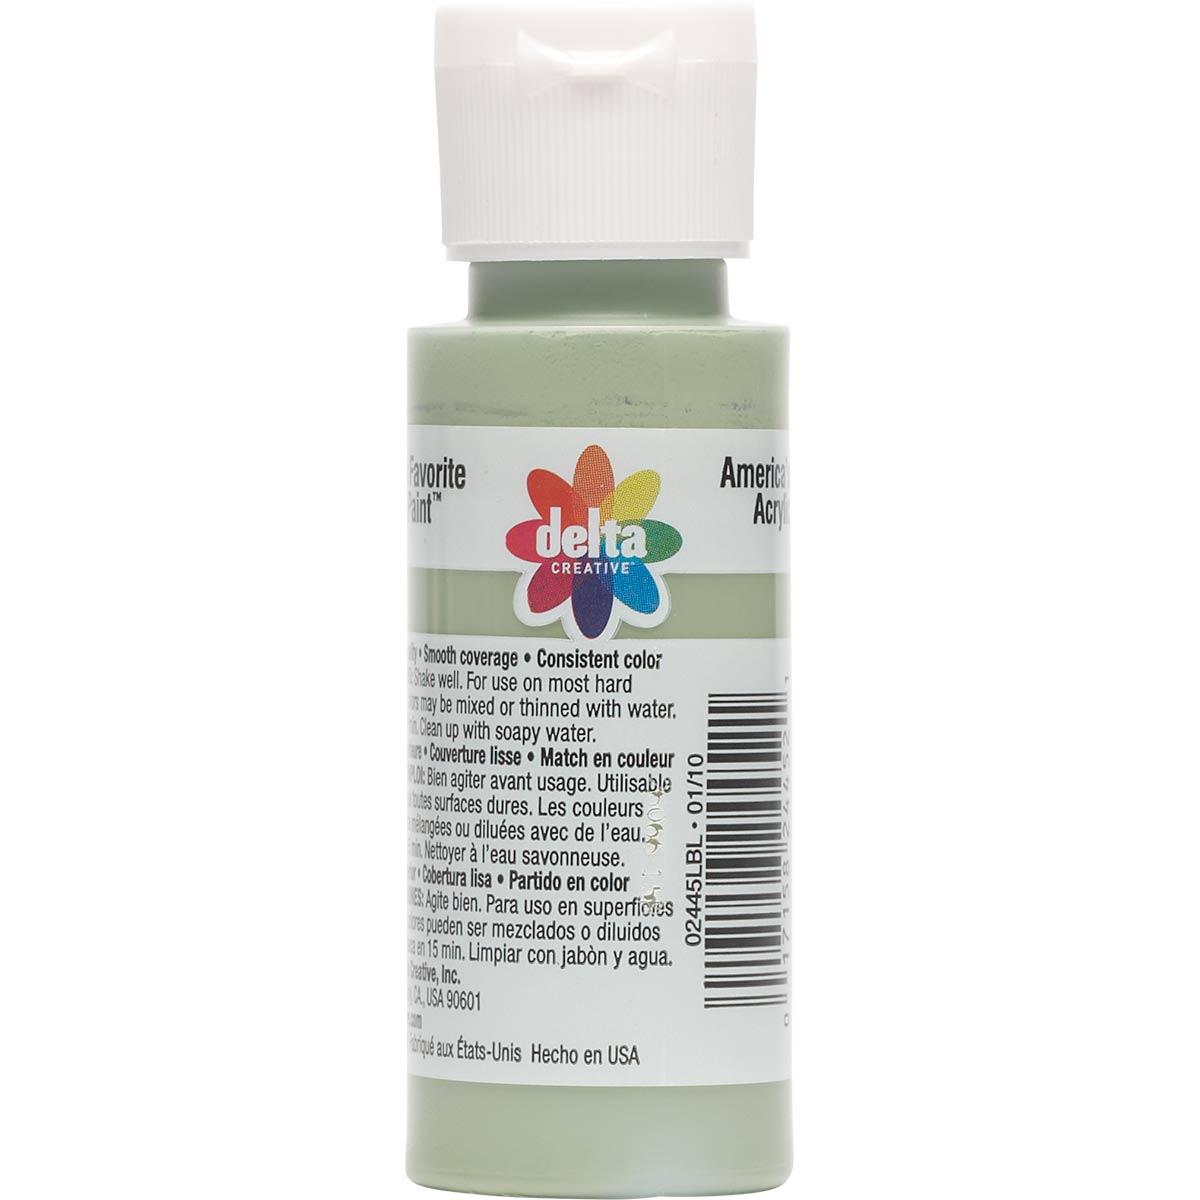 Delta Ceramcoat ® Acrylic Paint - Green Sea, 2 oz.